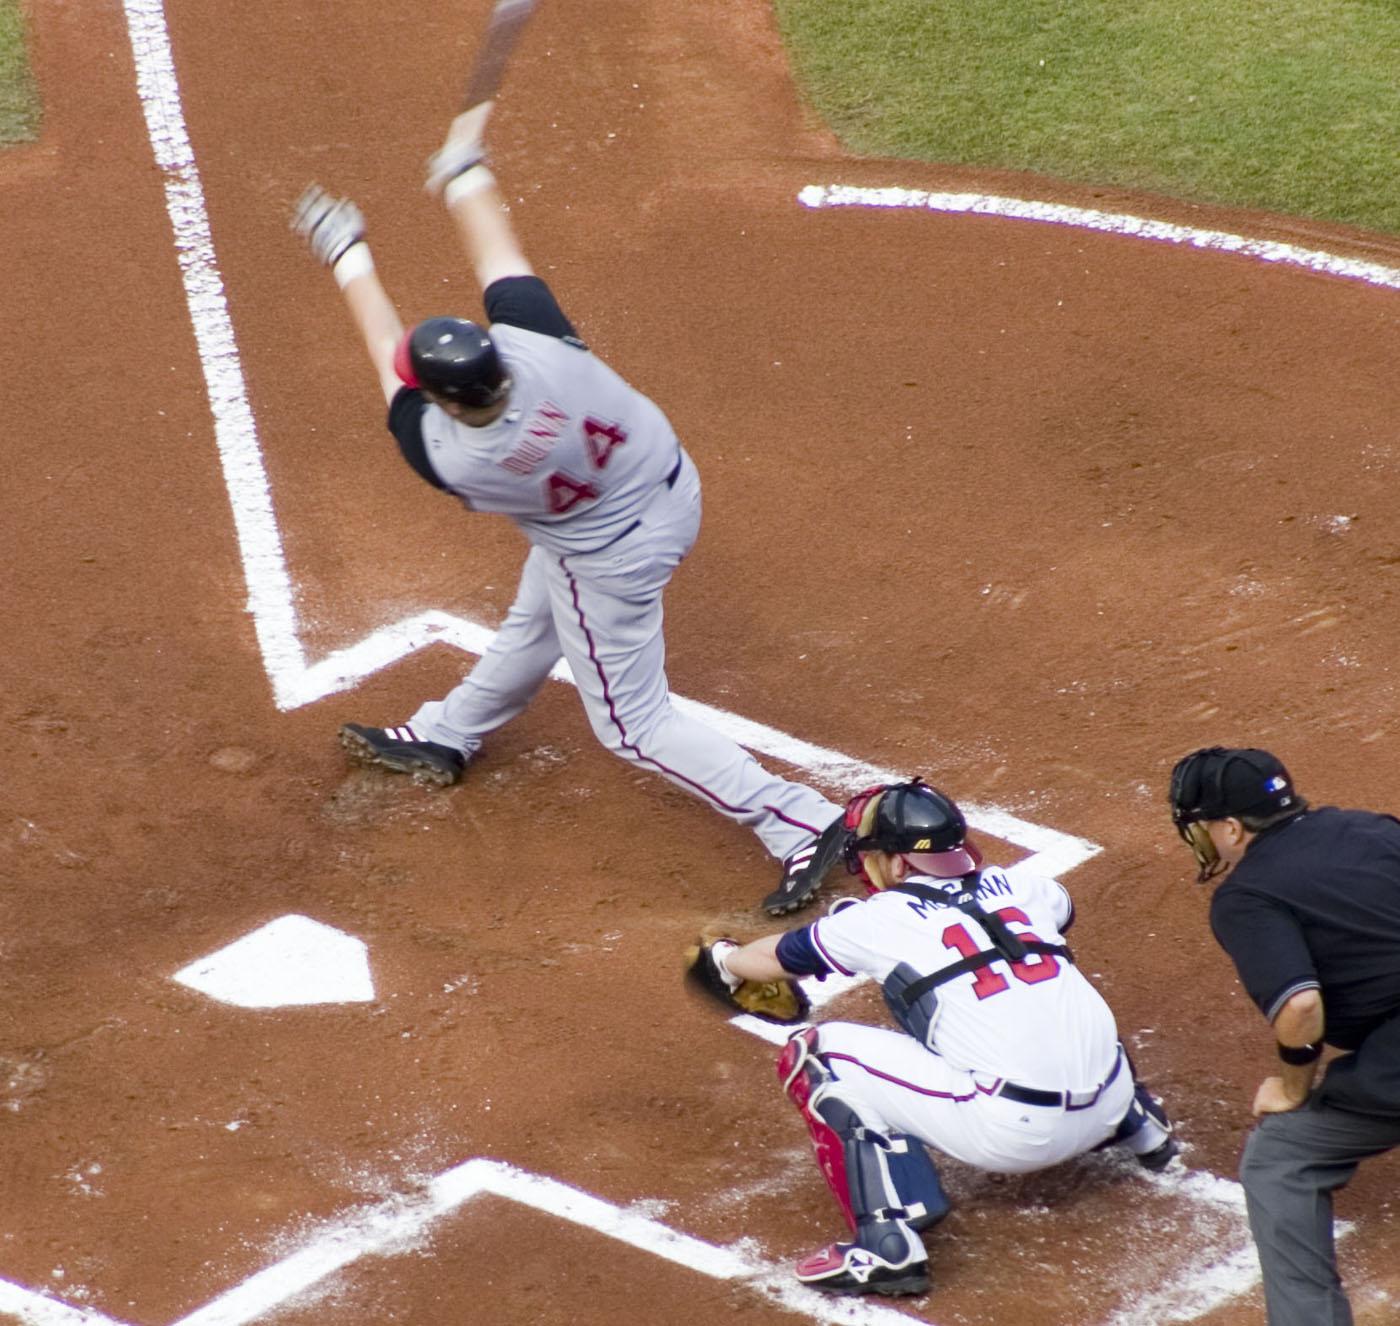 File:Swinging strikeout.jpg - Wikimedia Commons